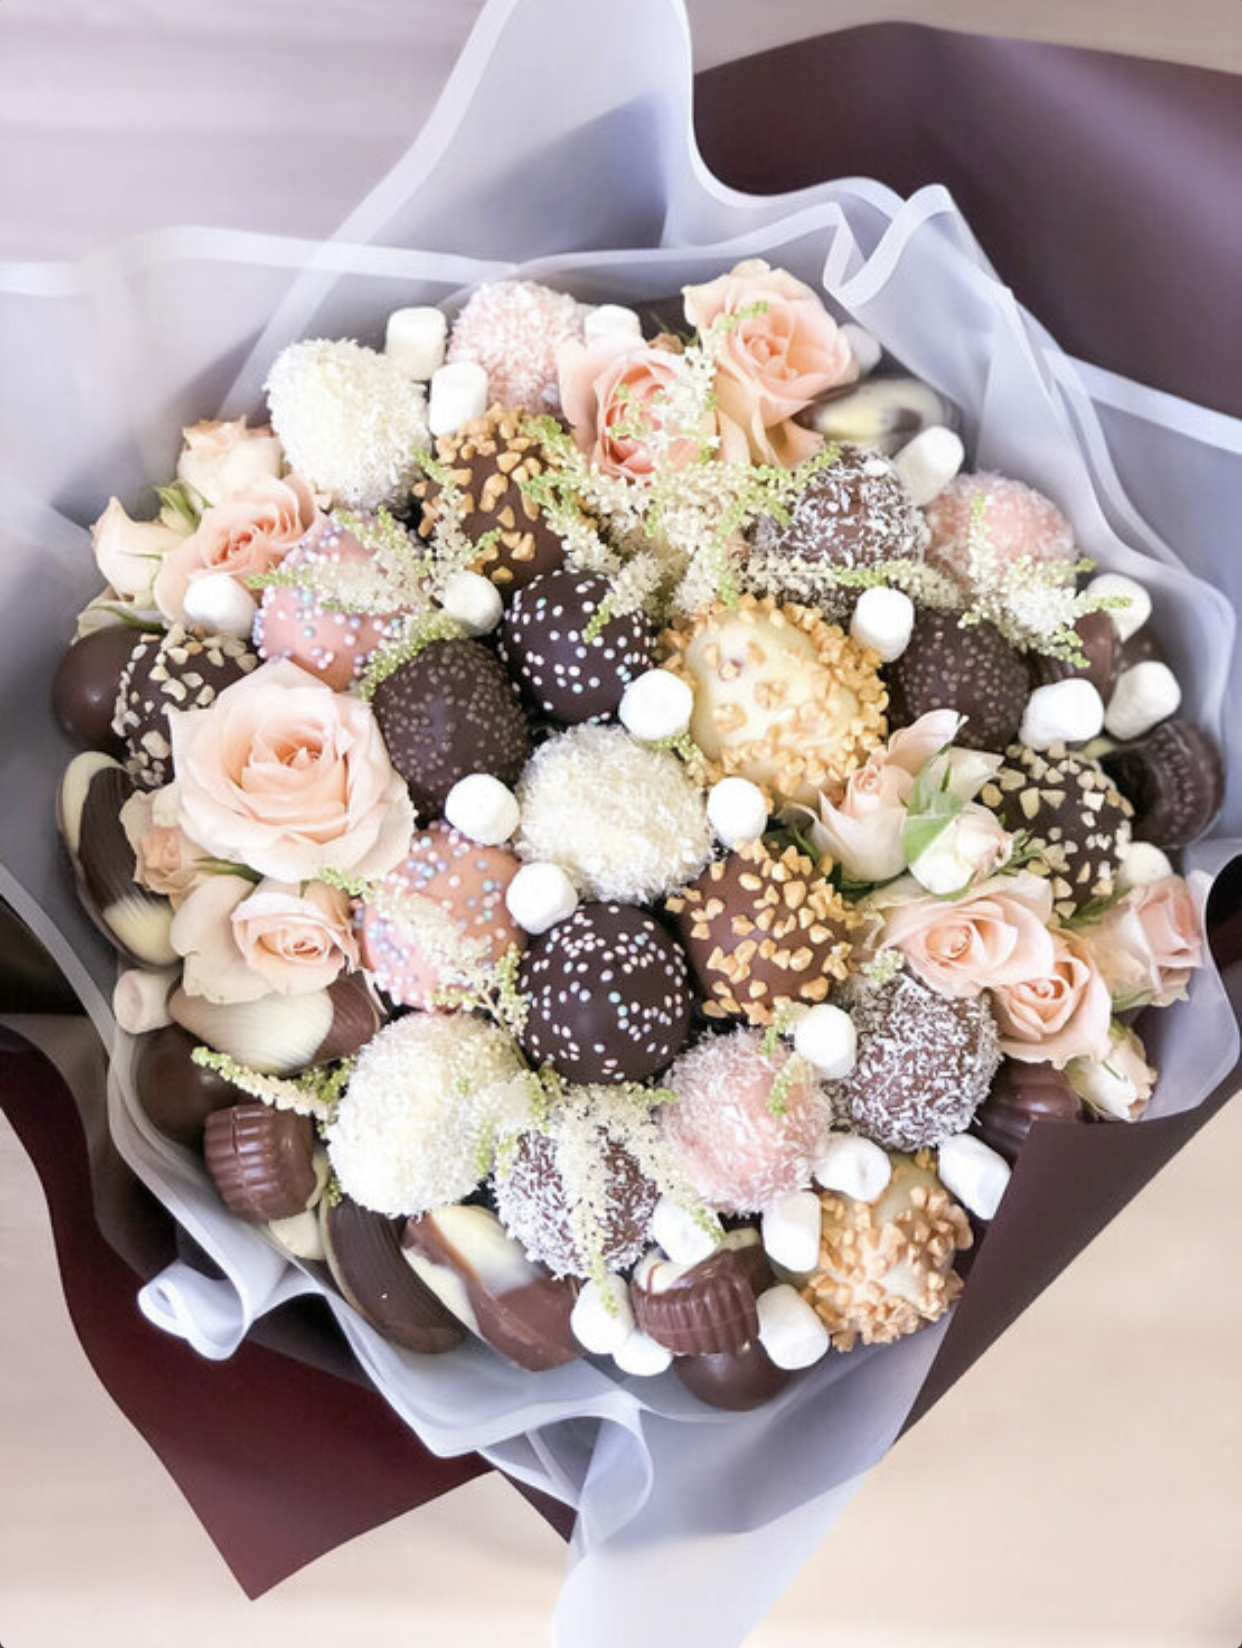 Клубника в шоколаде с цветами и конфетами